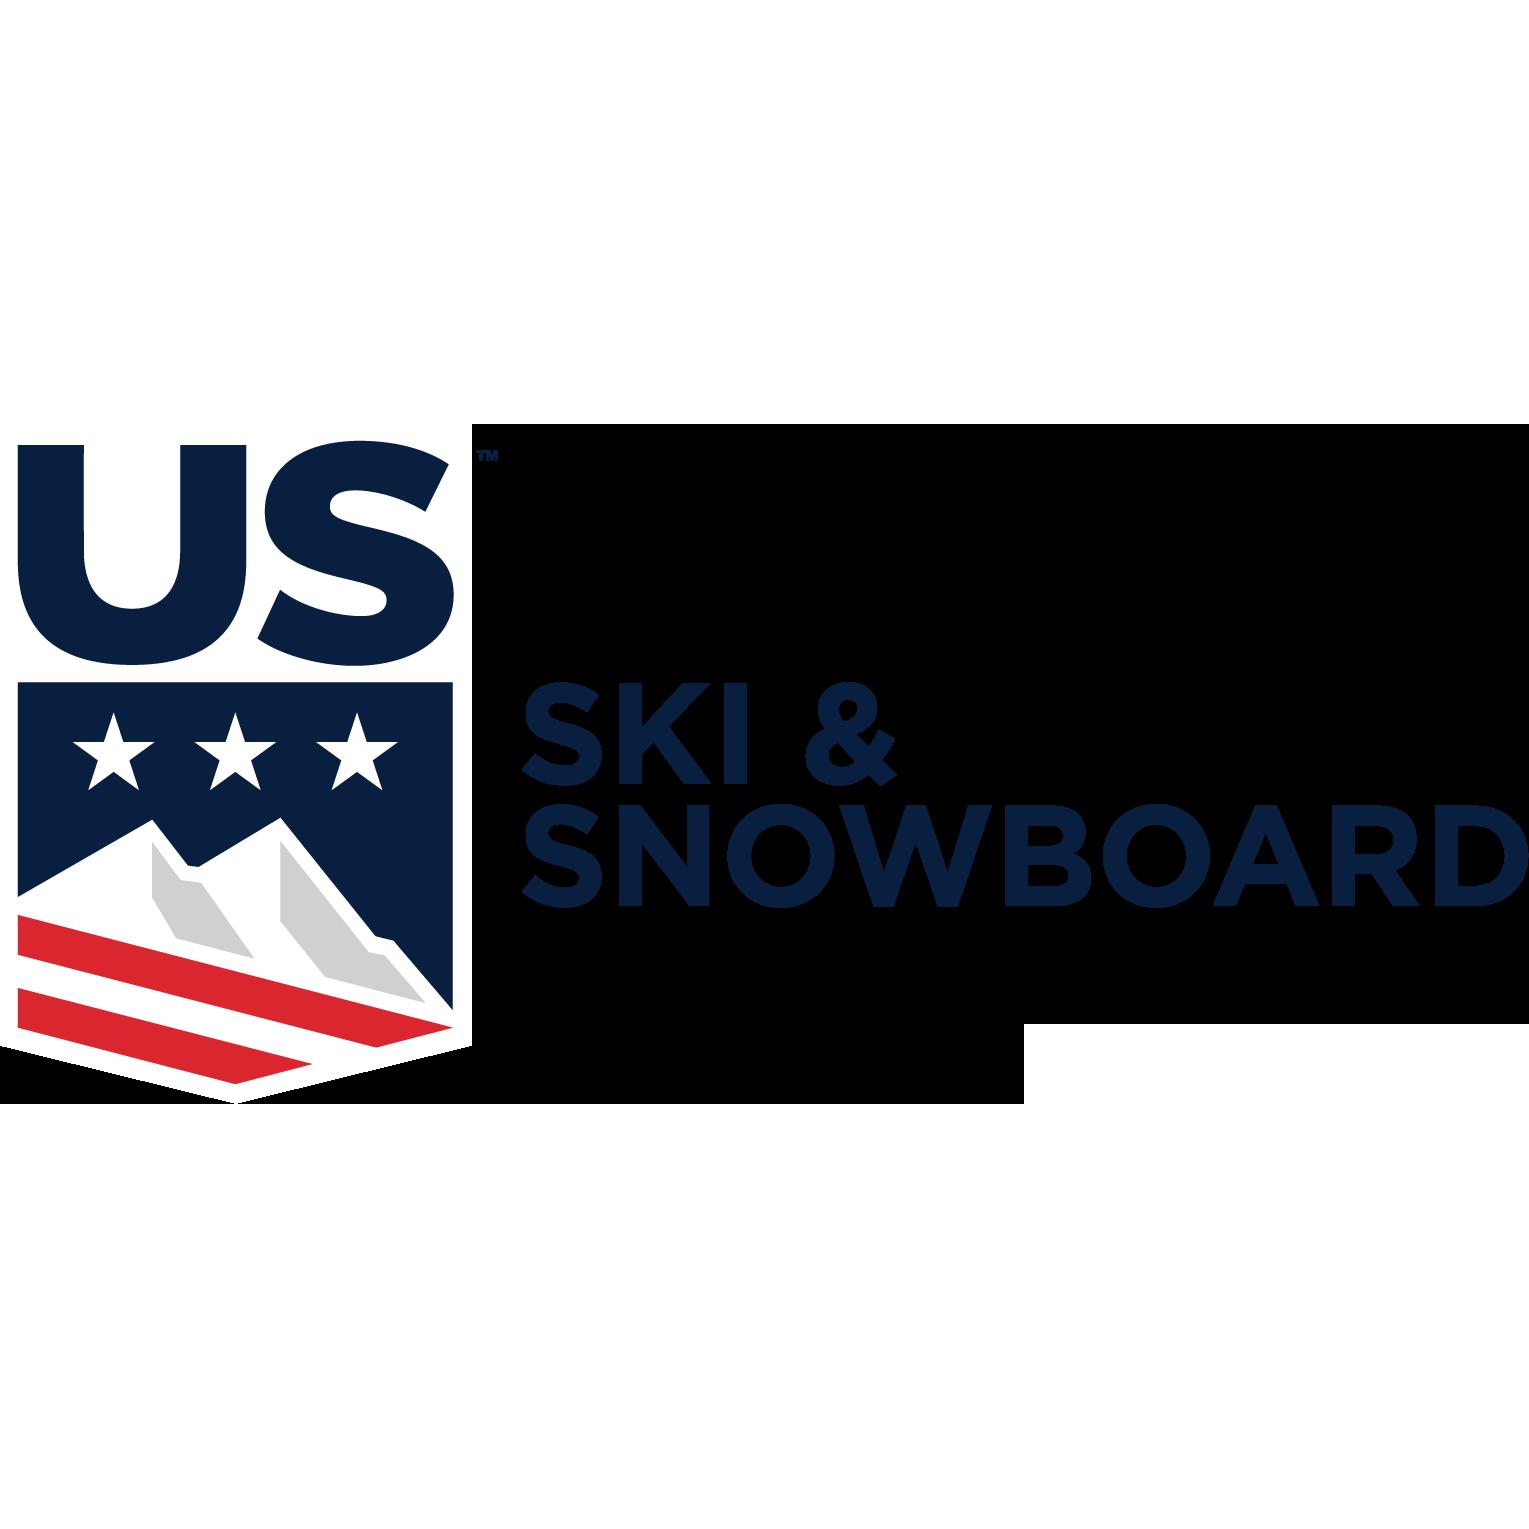 US-Ski-Snowboard-3.png